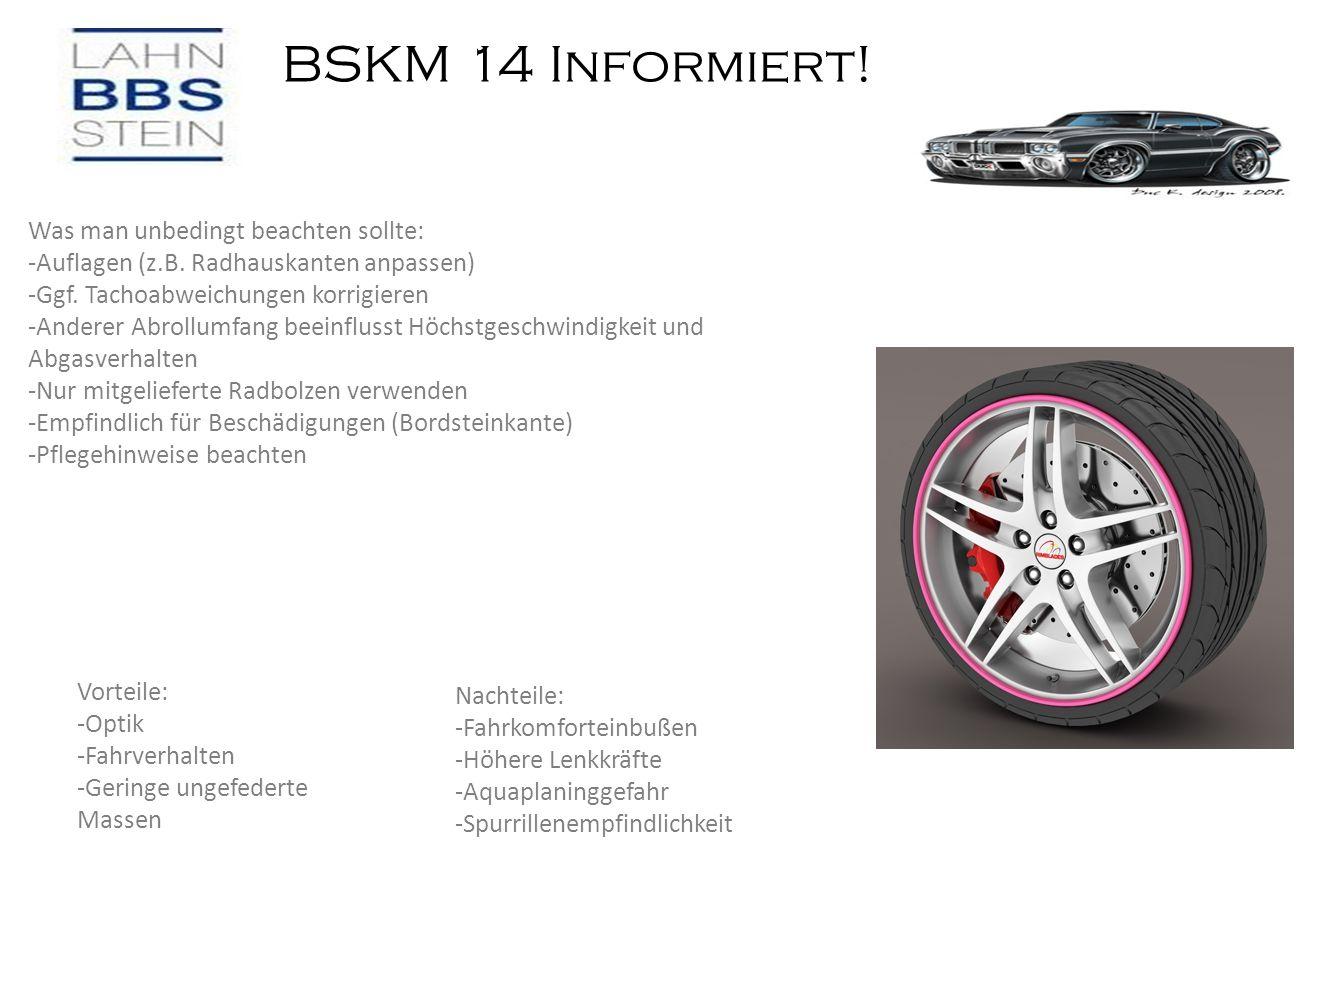 BSKM 14 Informiert! Was man unbedingt beachten sollte: -Auflagen (z.B. Radhauskanten anpassen) -Ggf. Tachoabweichungen korrigieren -Anderer Abrollumfa